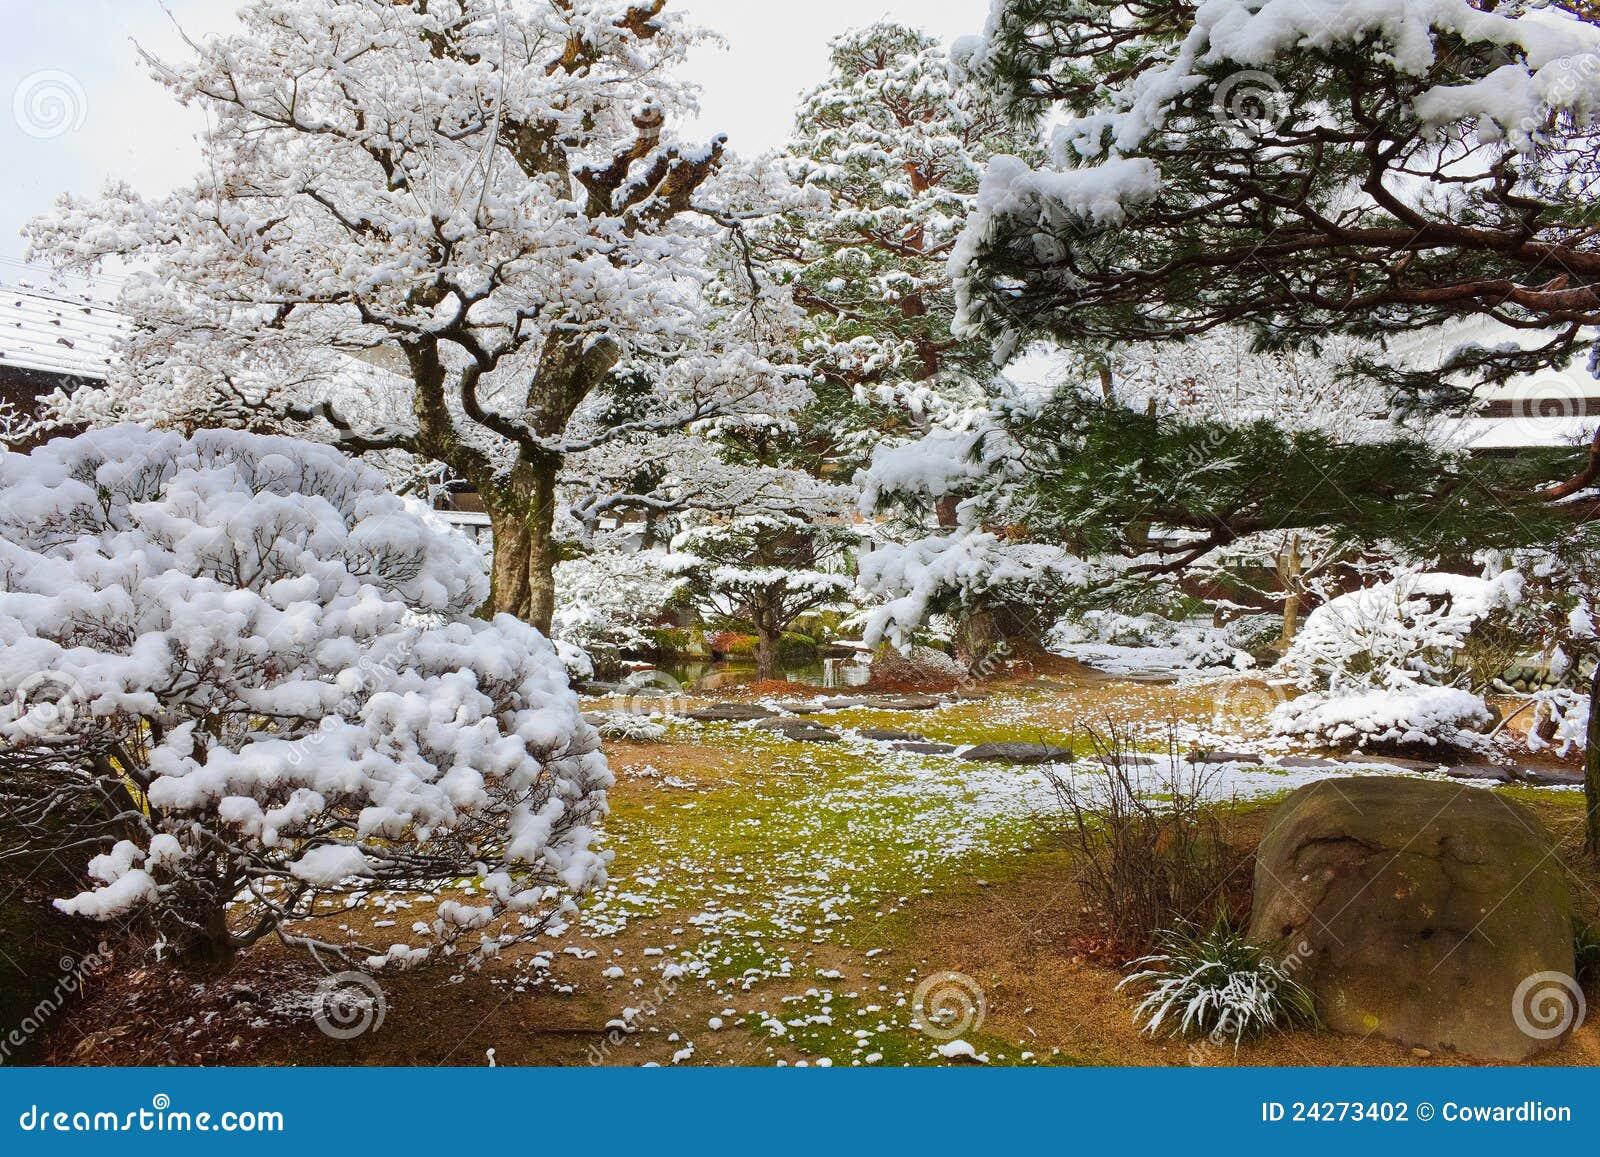 imagens jardim japones : imagens jardim japones:Japanese Gardens in Japan in Winter